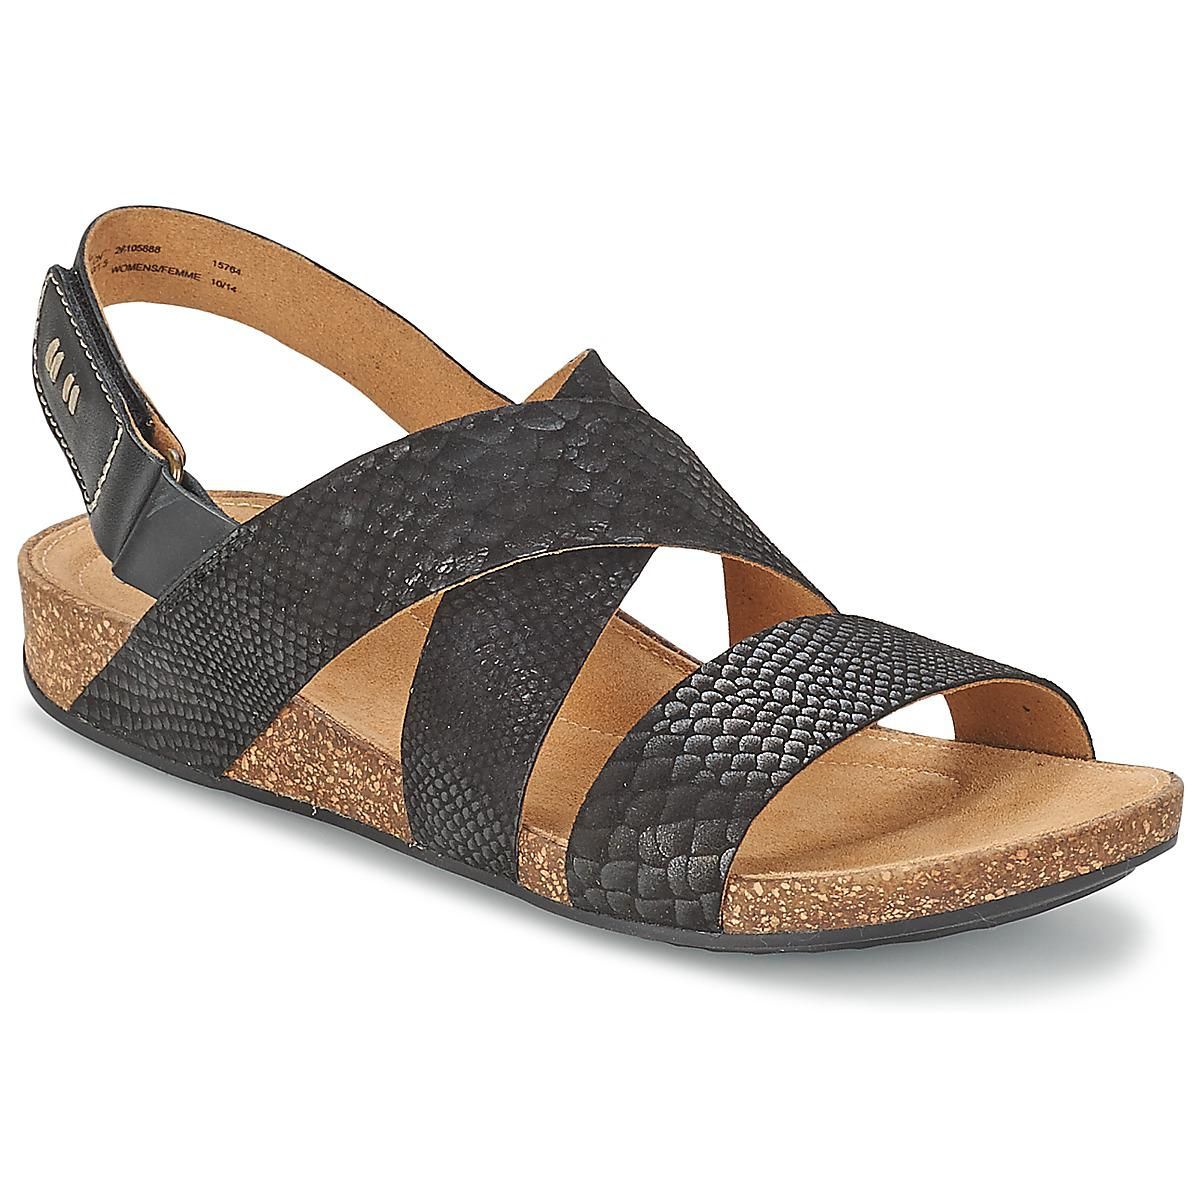 9af1d3770c0587 Clarks Perri Dunes Women s Sandals In Black in Black - Lyst